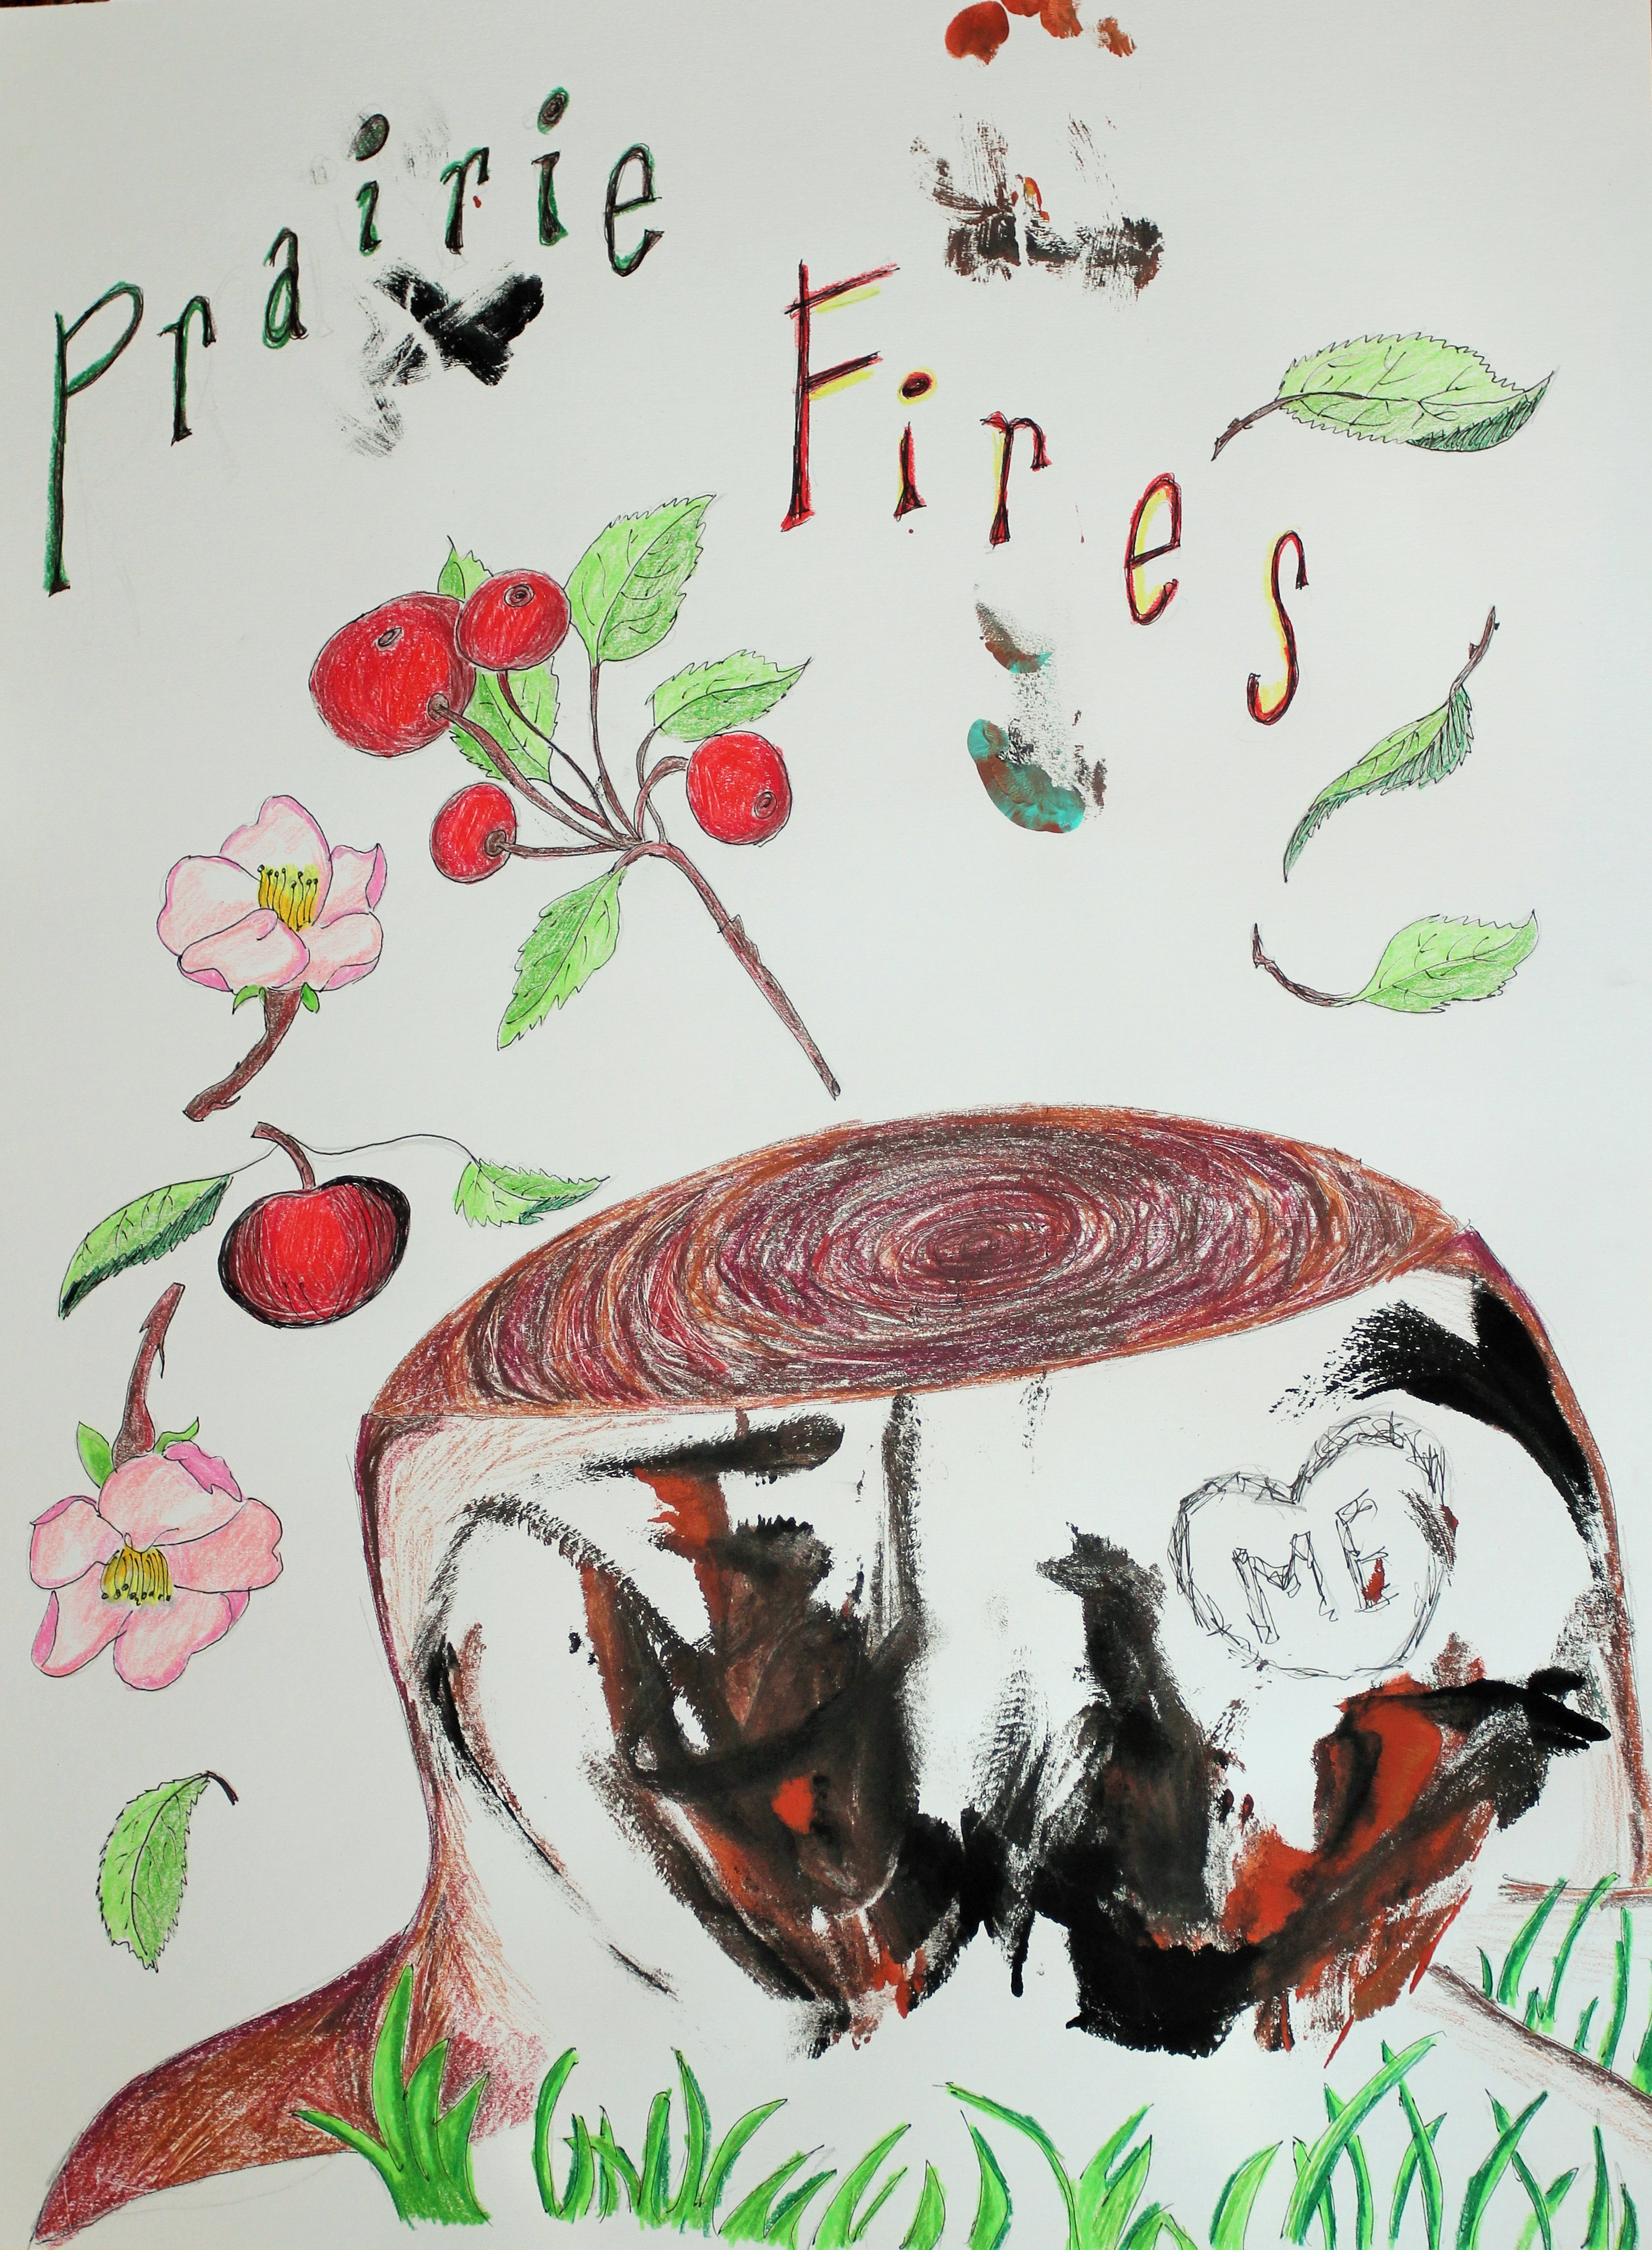 Deskins_Prairie Fires